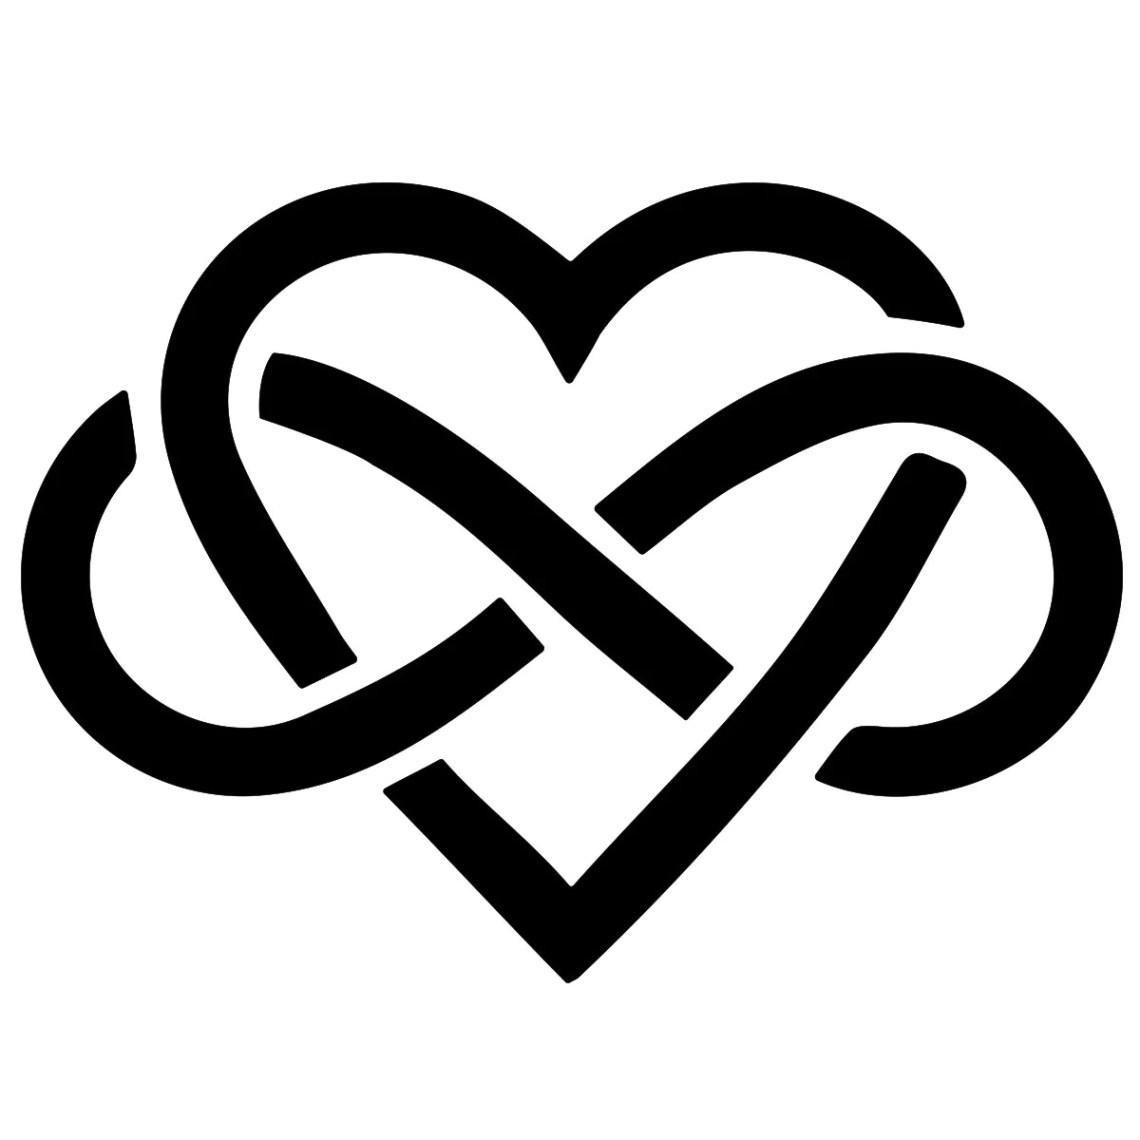 Download Infinity Sign Inside Heart SVG File | Etsy